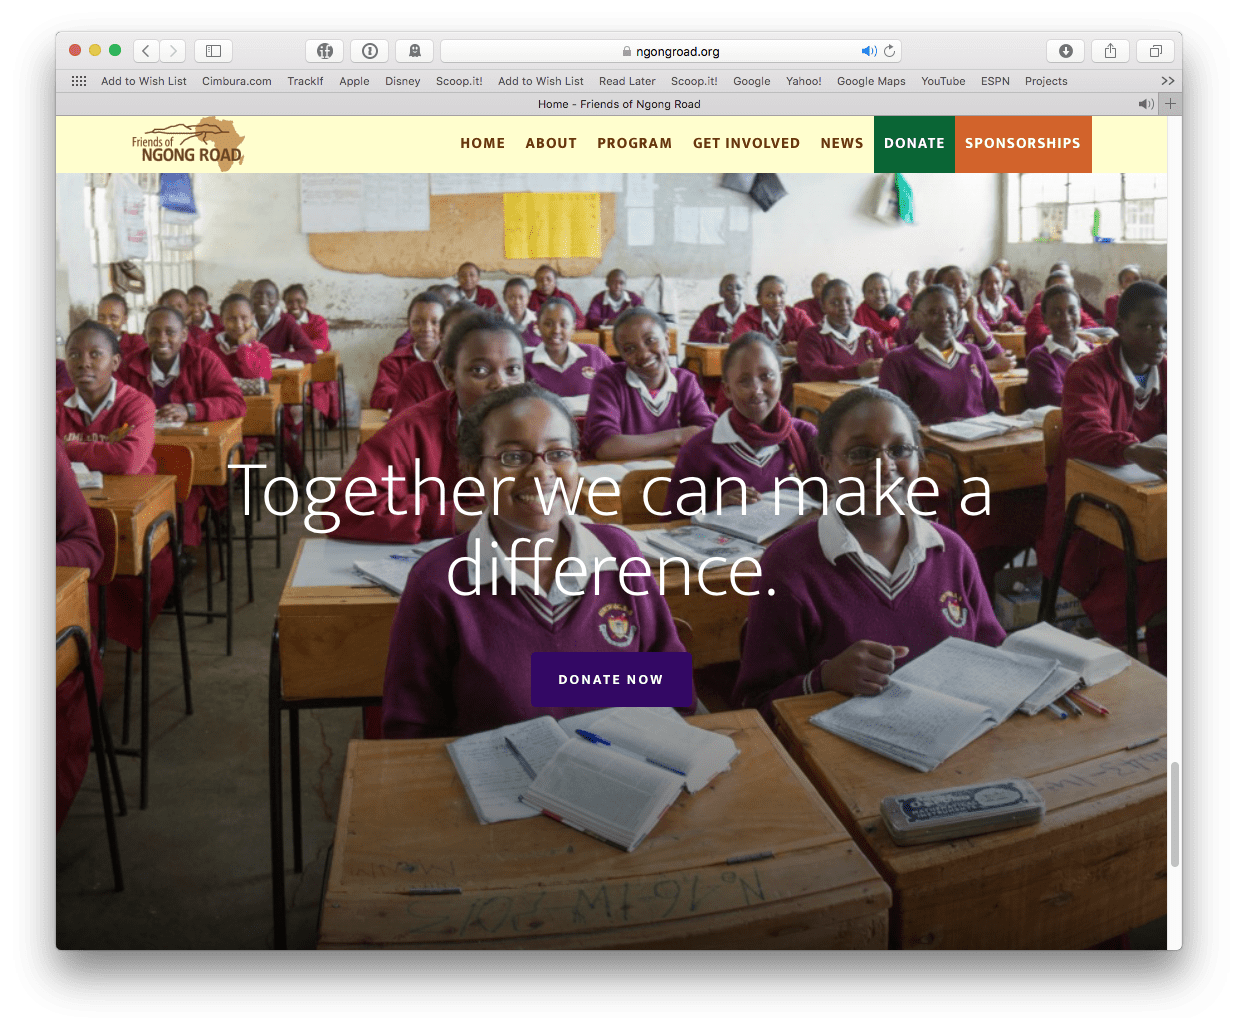 LuminFire Provides Matching Grants to Nonprofit Organizations 2